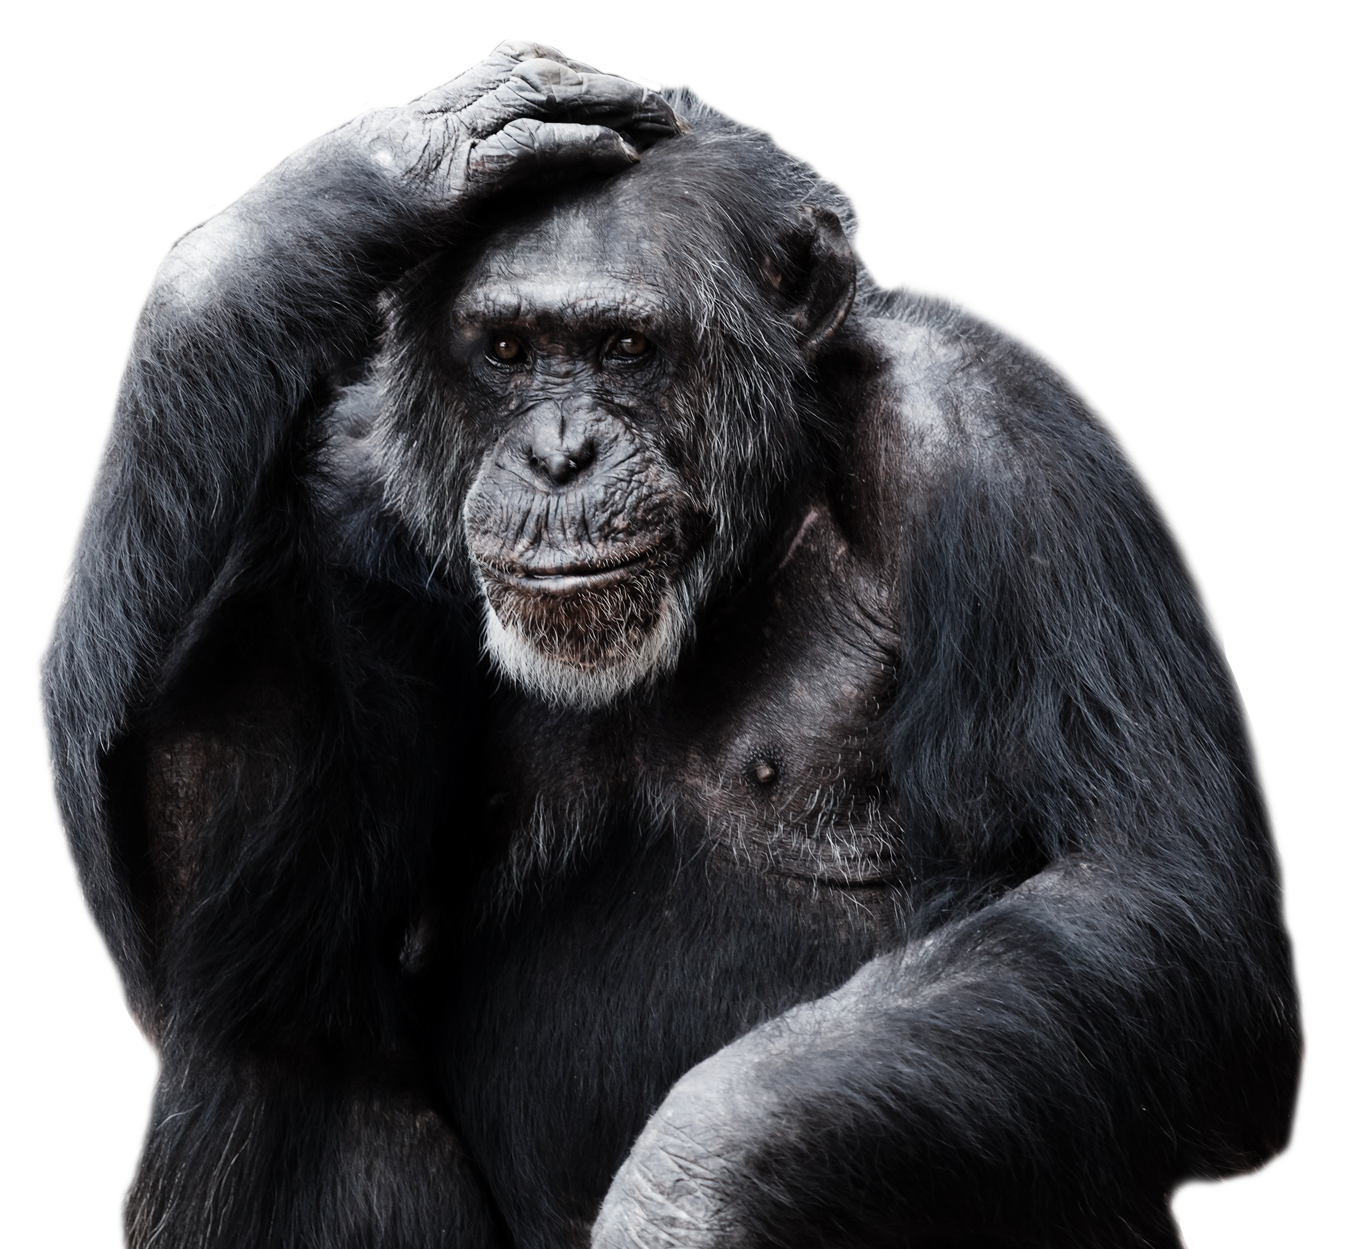 Gorilla clipart zoo gorilla. Chimpanzee png image purepng